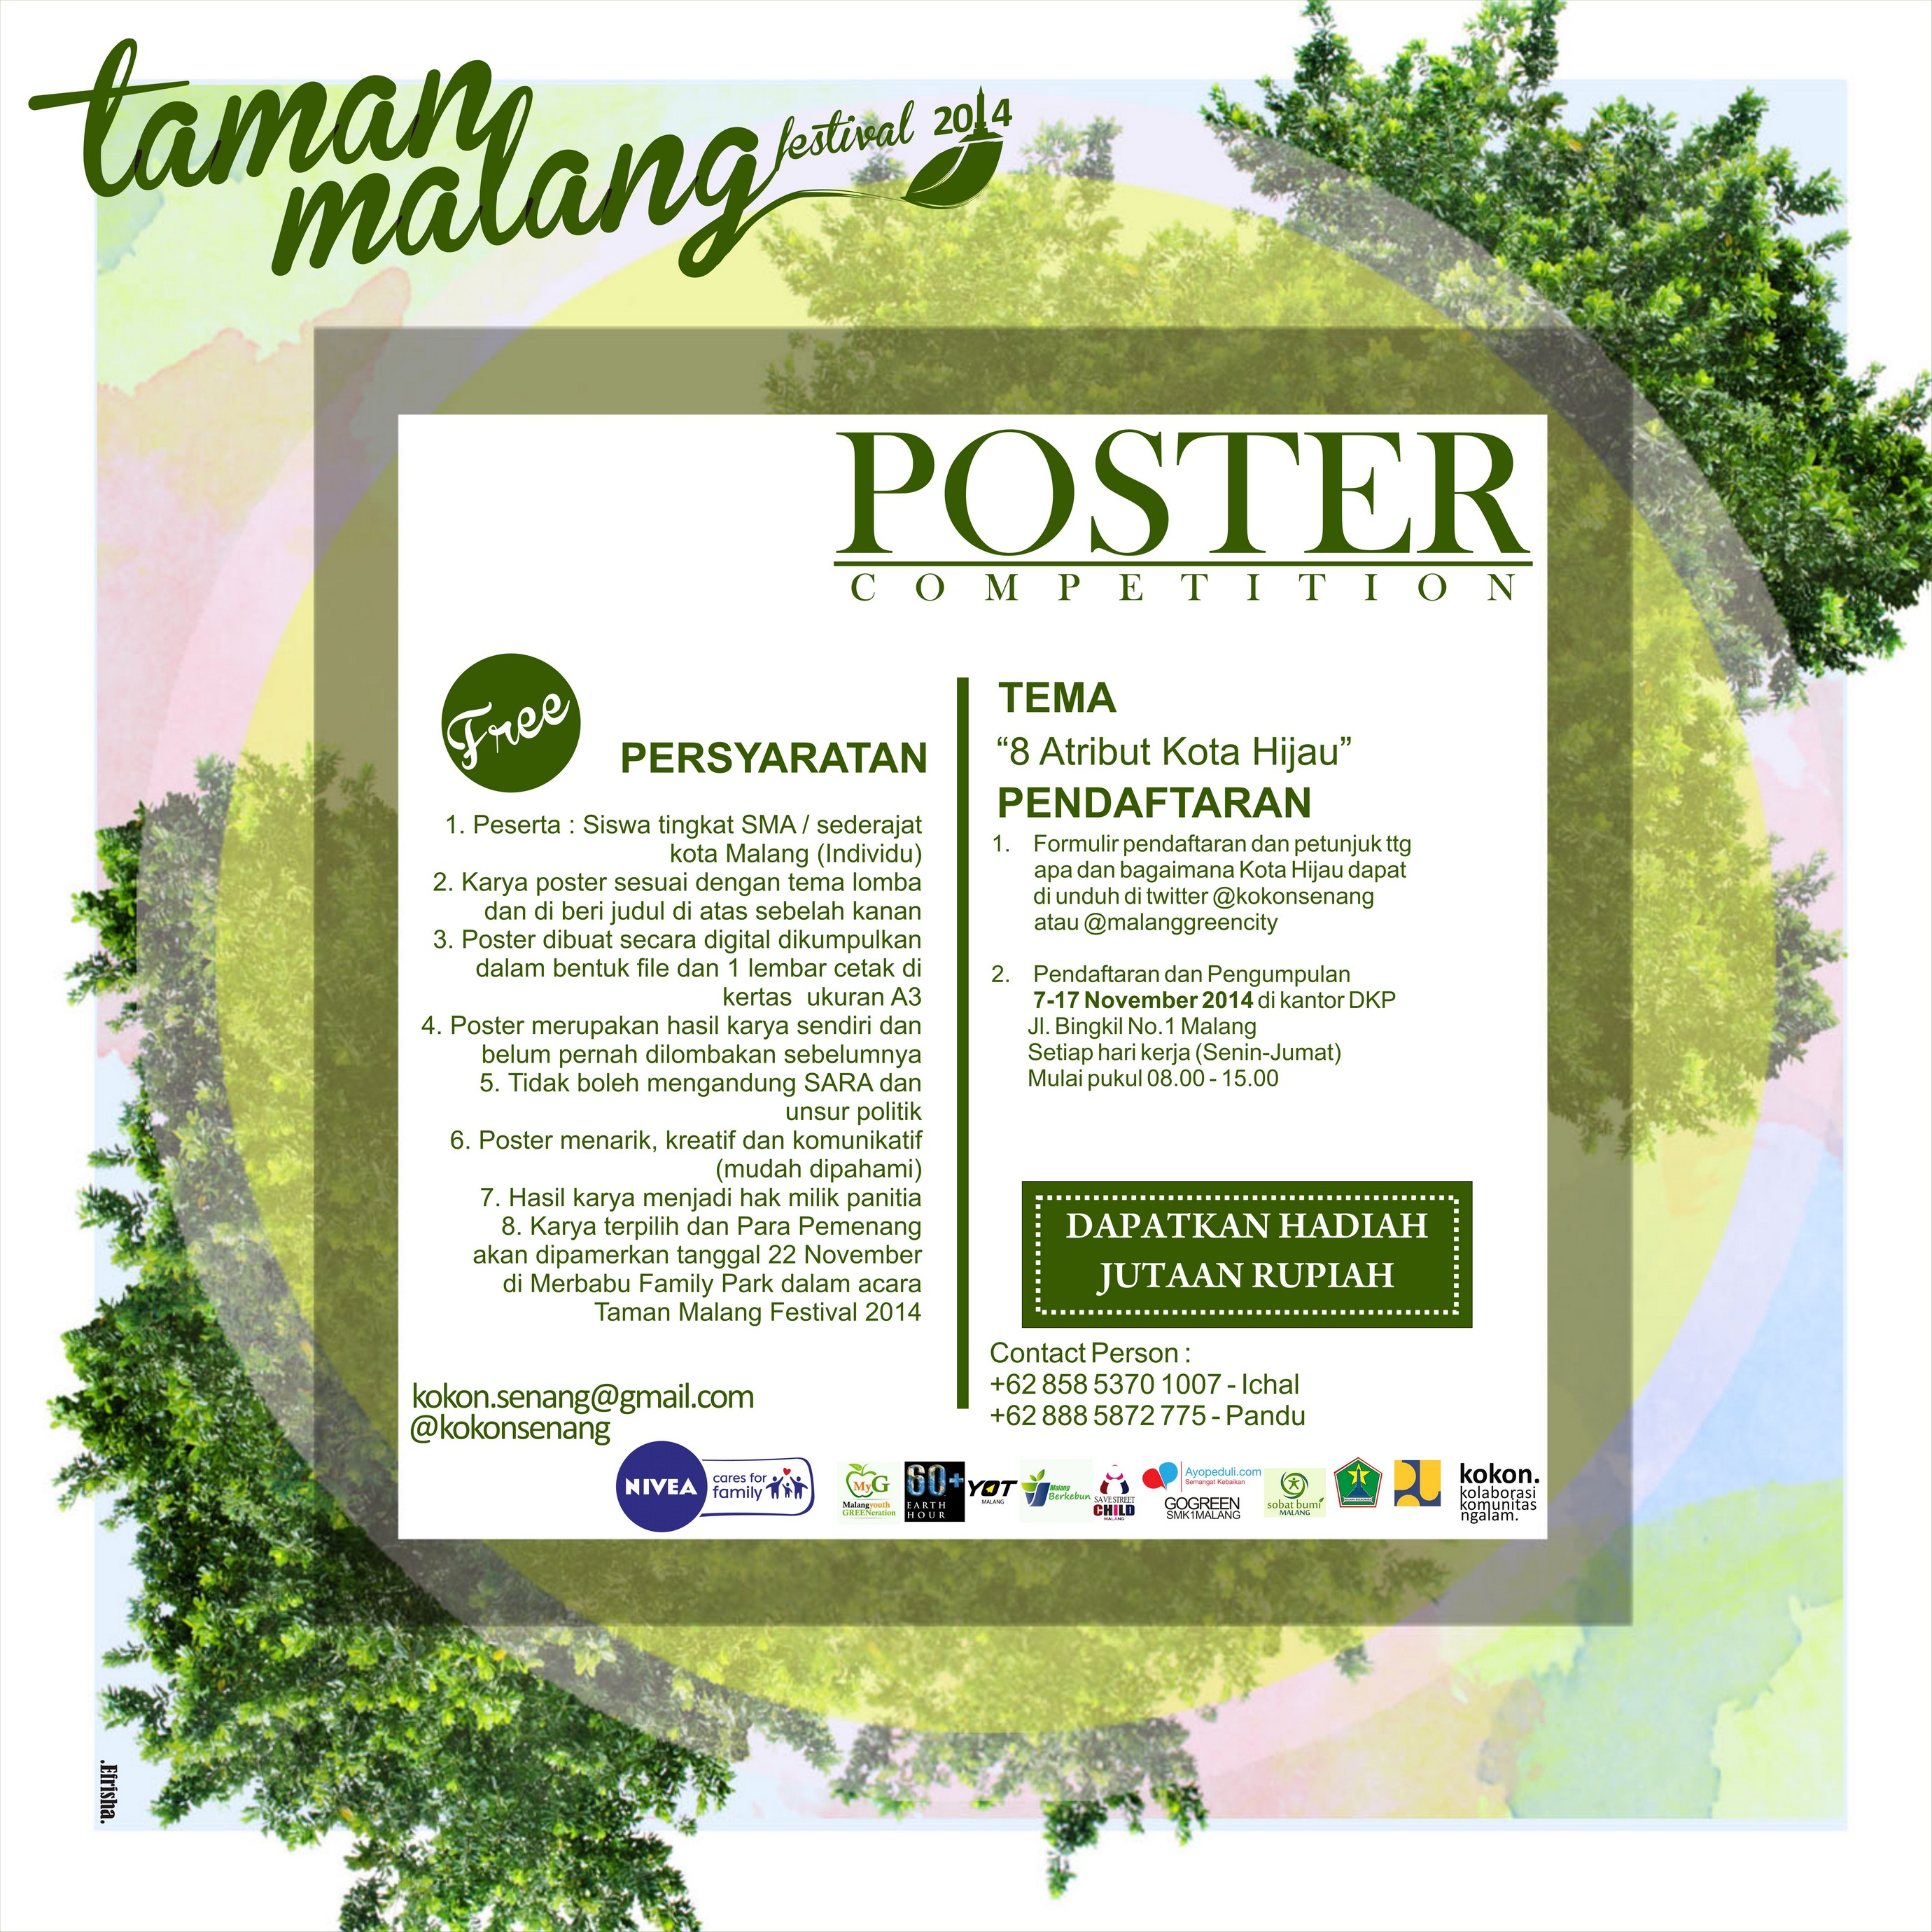 Taman Malang Festival Media Center Kendedes Info Publik Kota Lomba